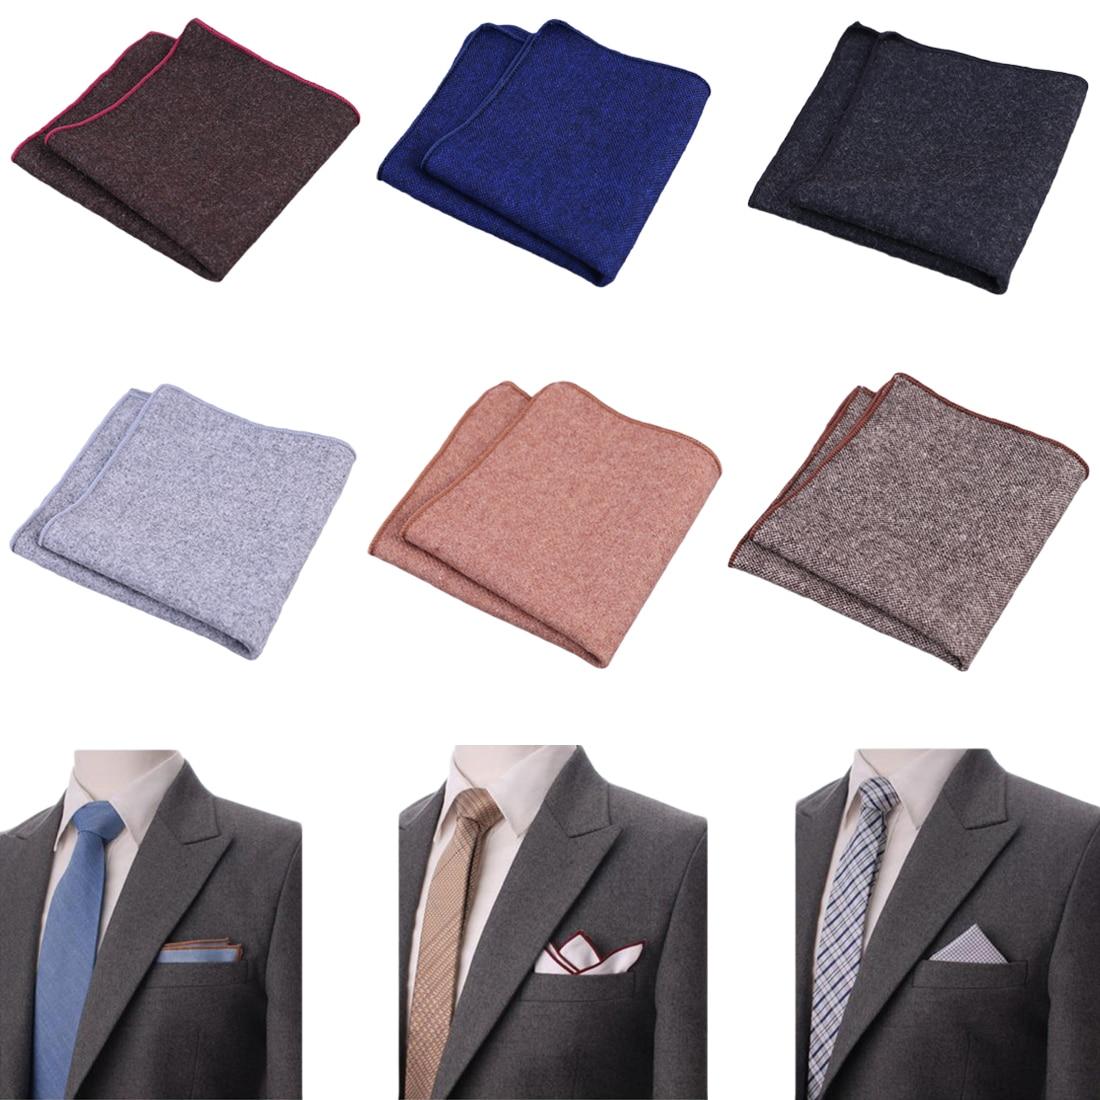 Comfortable Hankerchief Scarves Vintage Wool Hankies Men's Pocket Square Handkerchiefs Striped Solid Cotton 23*23cm